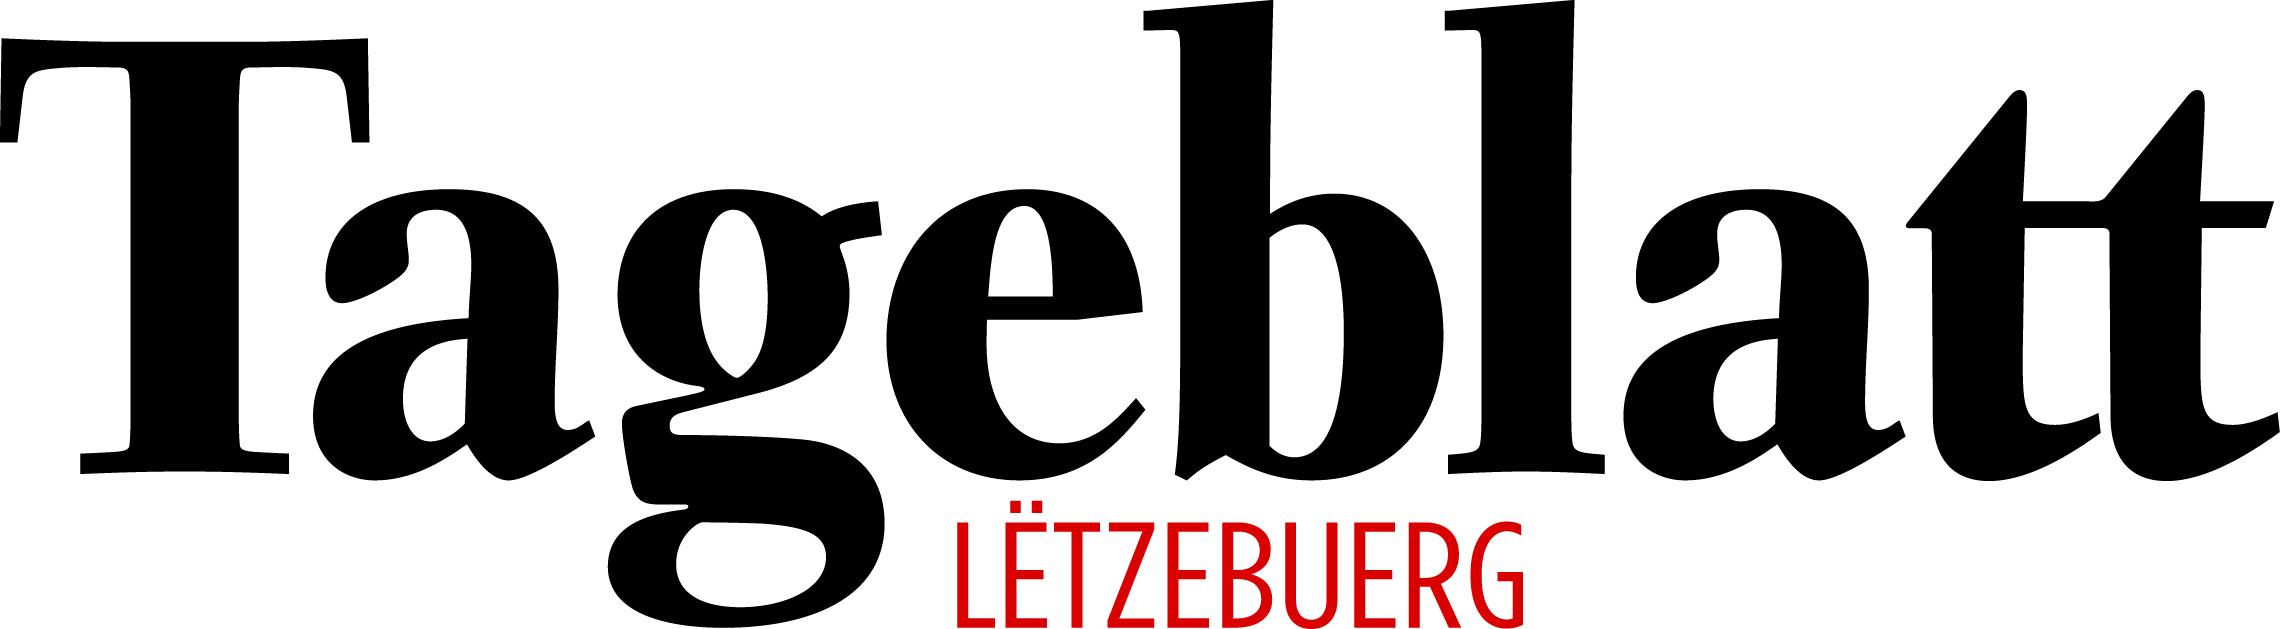 Publi-Reportage Europa League Tageblatt 30.07.2019